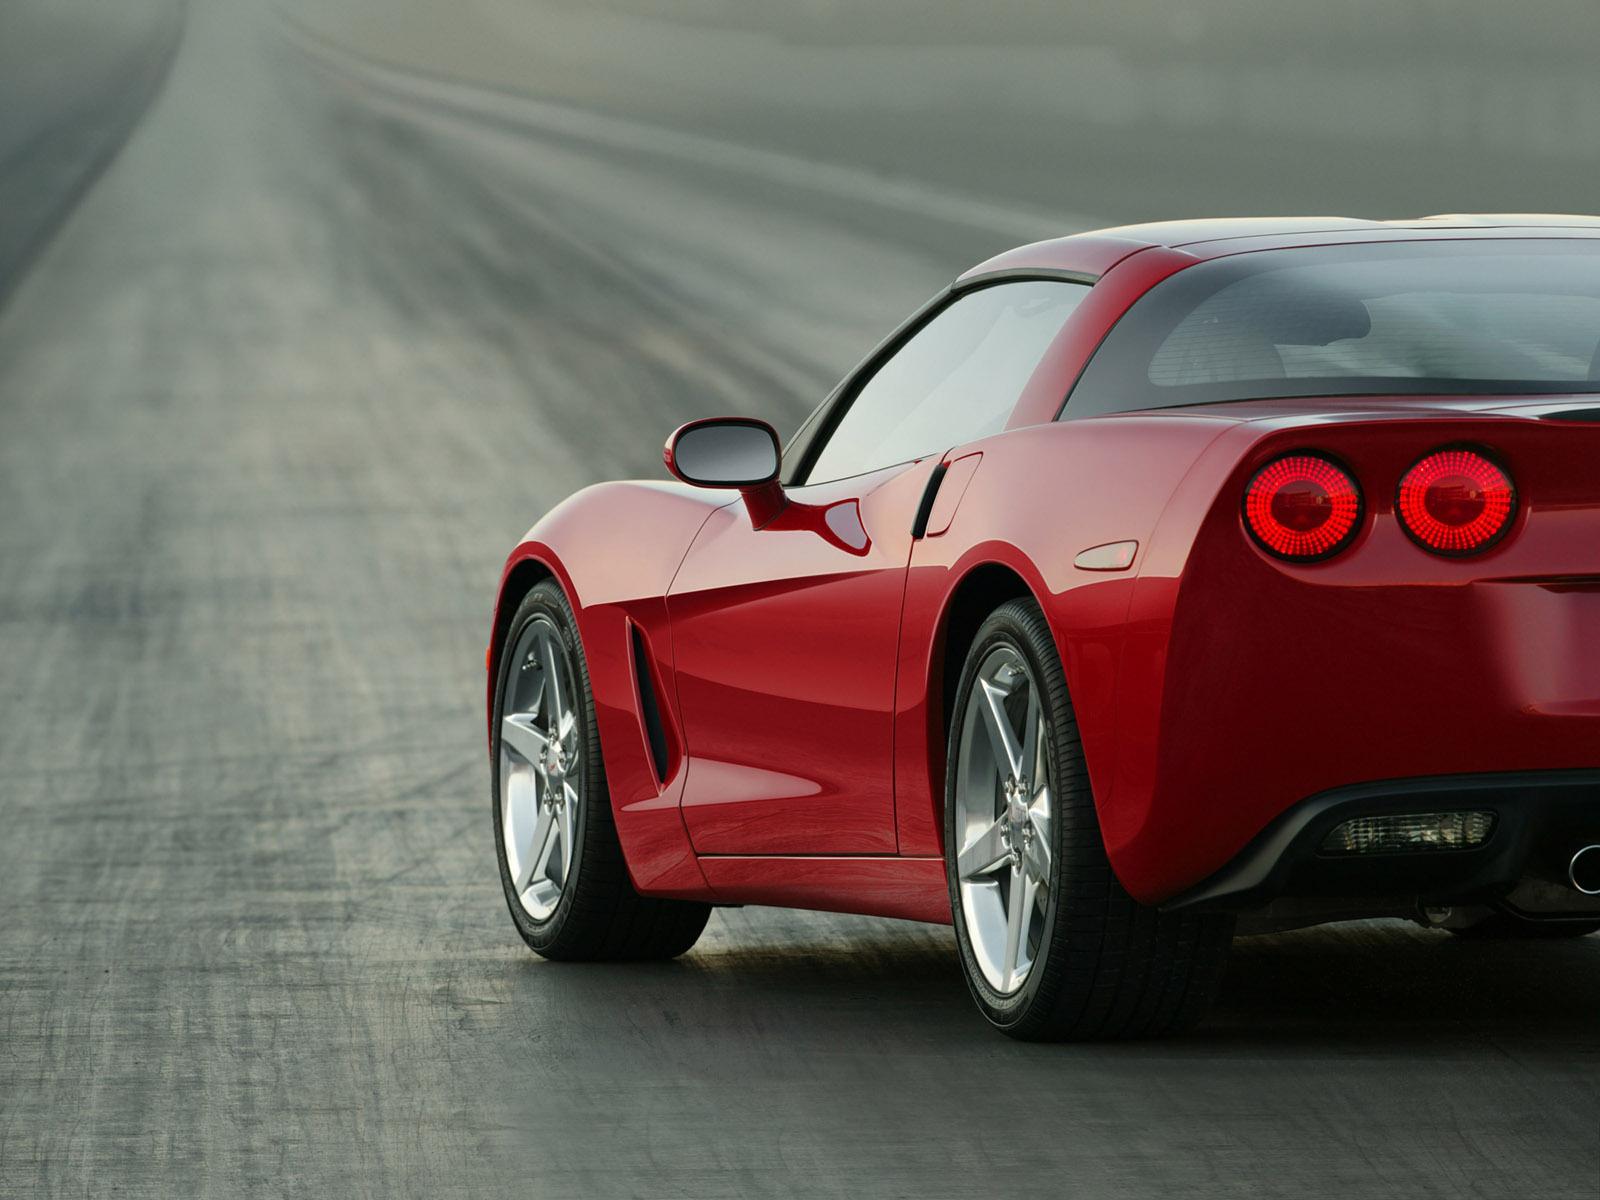 http://1.bp.blogspot.com/-vdzo_NzWNY0/T2HFt3dlvCI/AAAAAAAABeo/XPSmQrWYyqs/s1600/2005-Chevrolet-Corvette-C6-rear-h-1600x1200.jpg